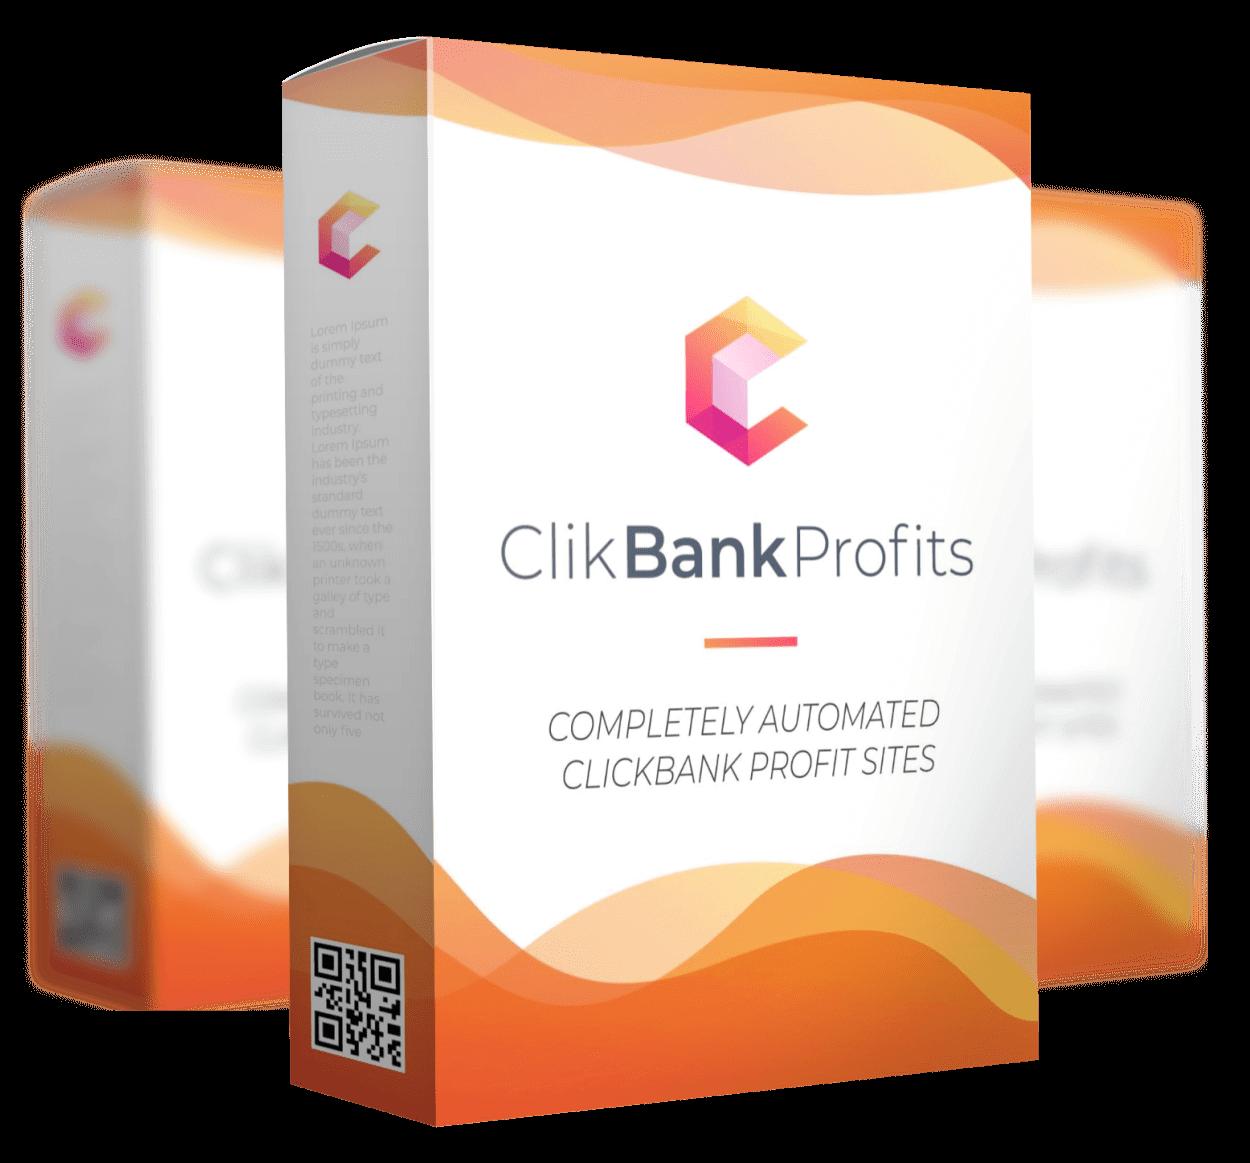 ClickBankProfits Review